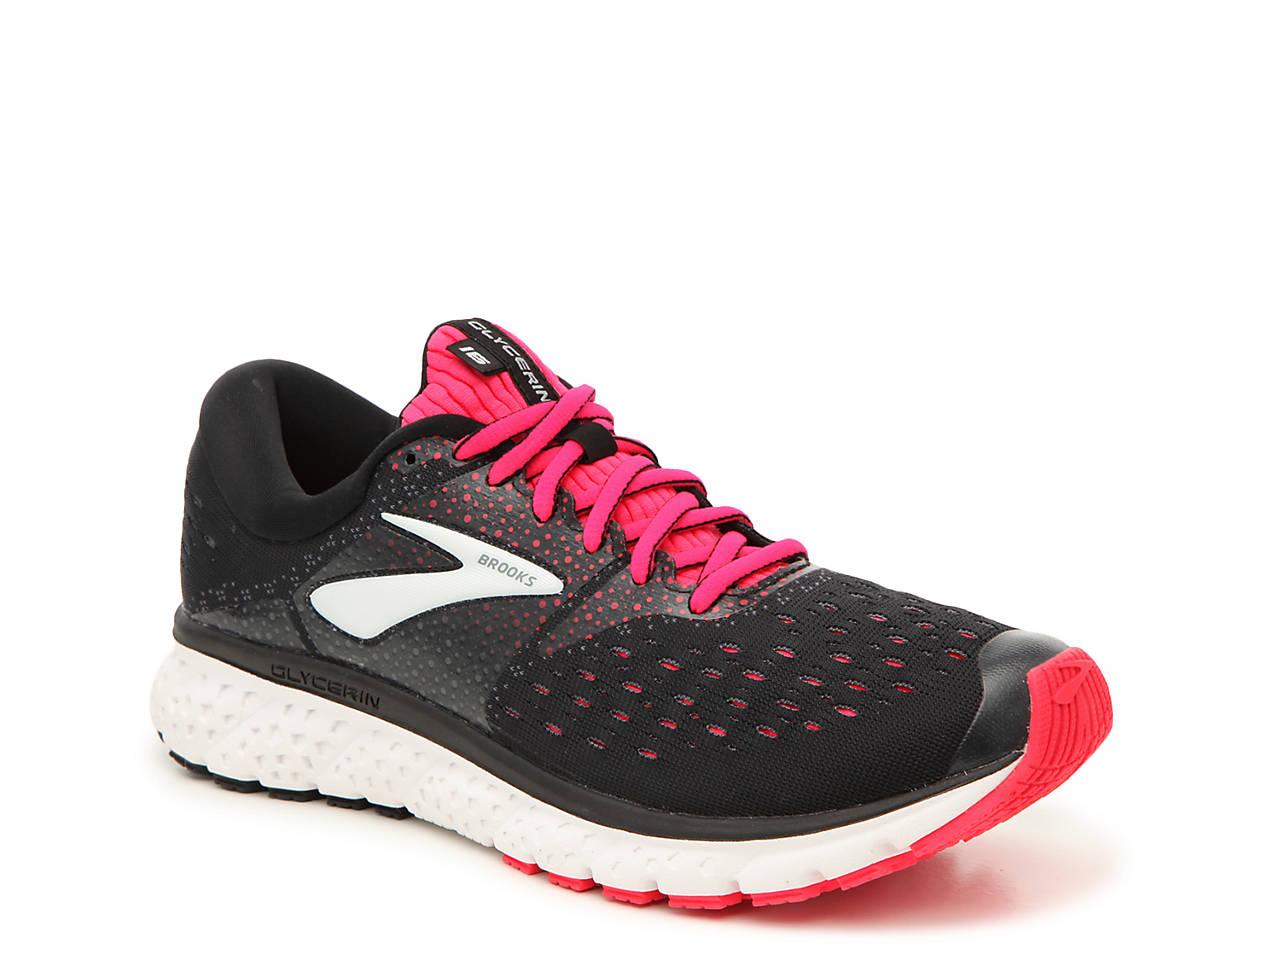 f383d253bef30 Brooks Glycerin 16 Running Shoe - Women s Women s Shoes